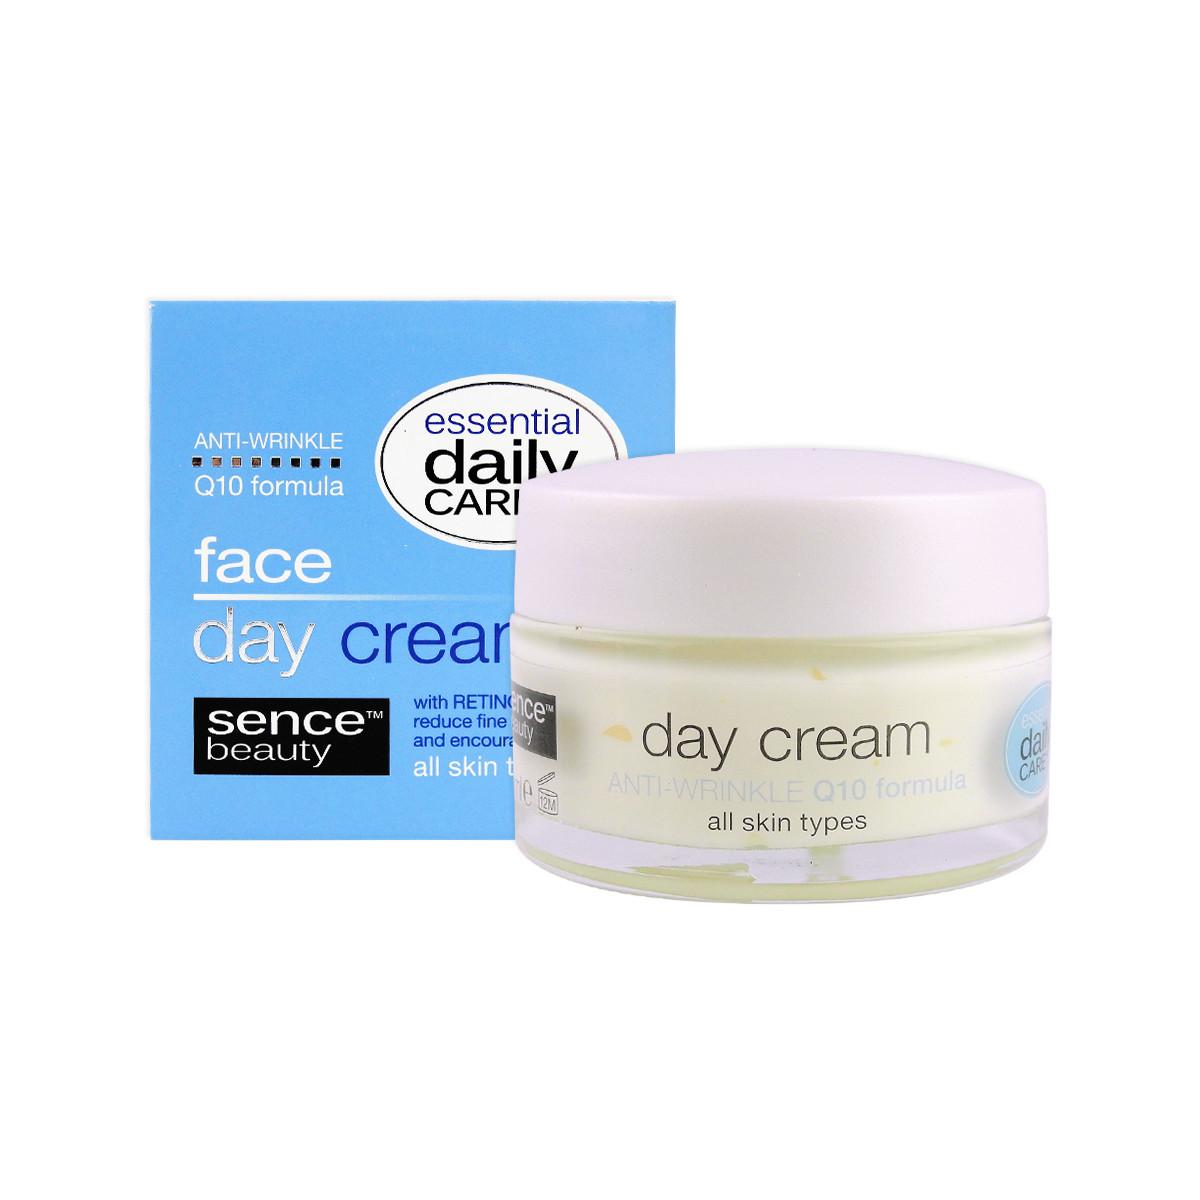 image of 歐洲Sencebeauty Q10緊實煥顏日霜50ml  Europe Sencebeauty FACE DAY CREAM Q10, 50 ML - ALL SKIN TYPES